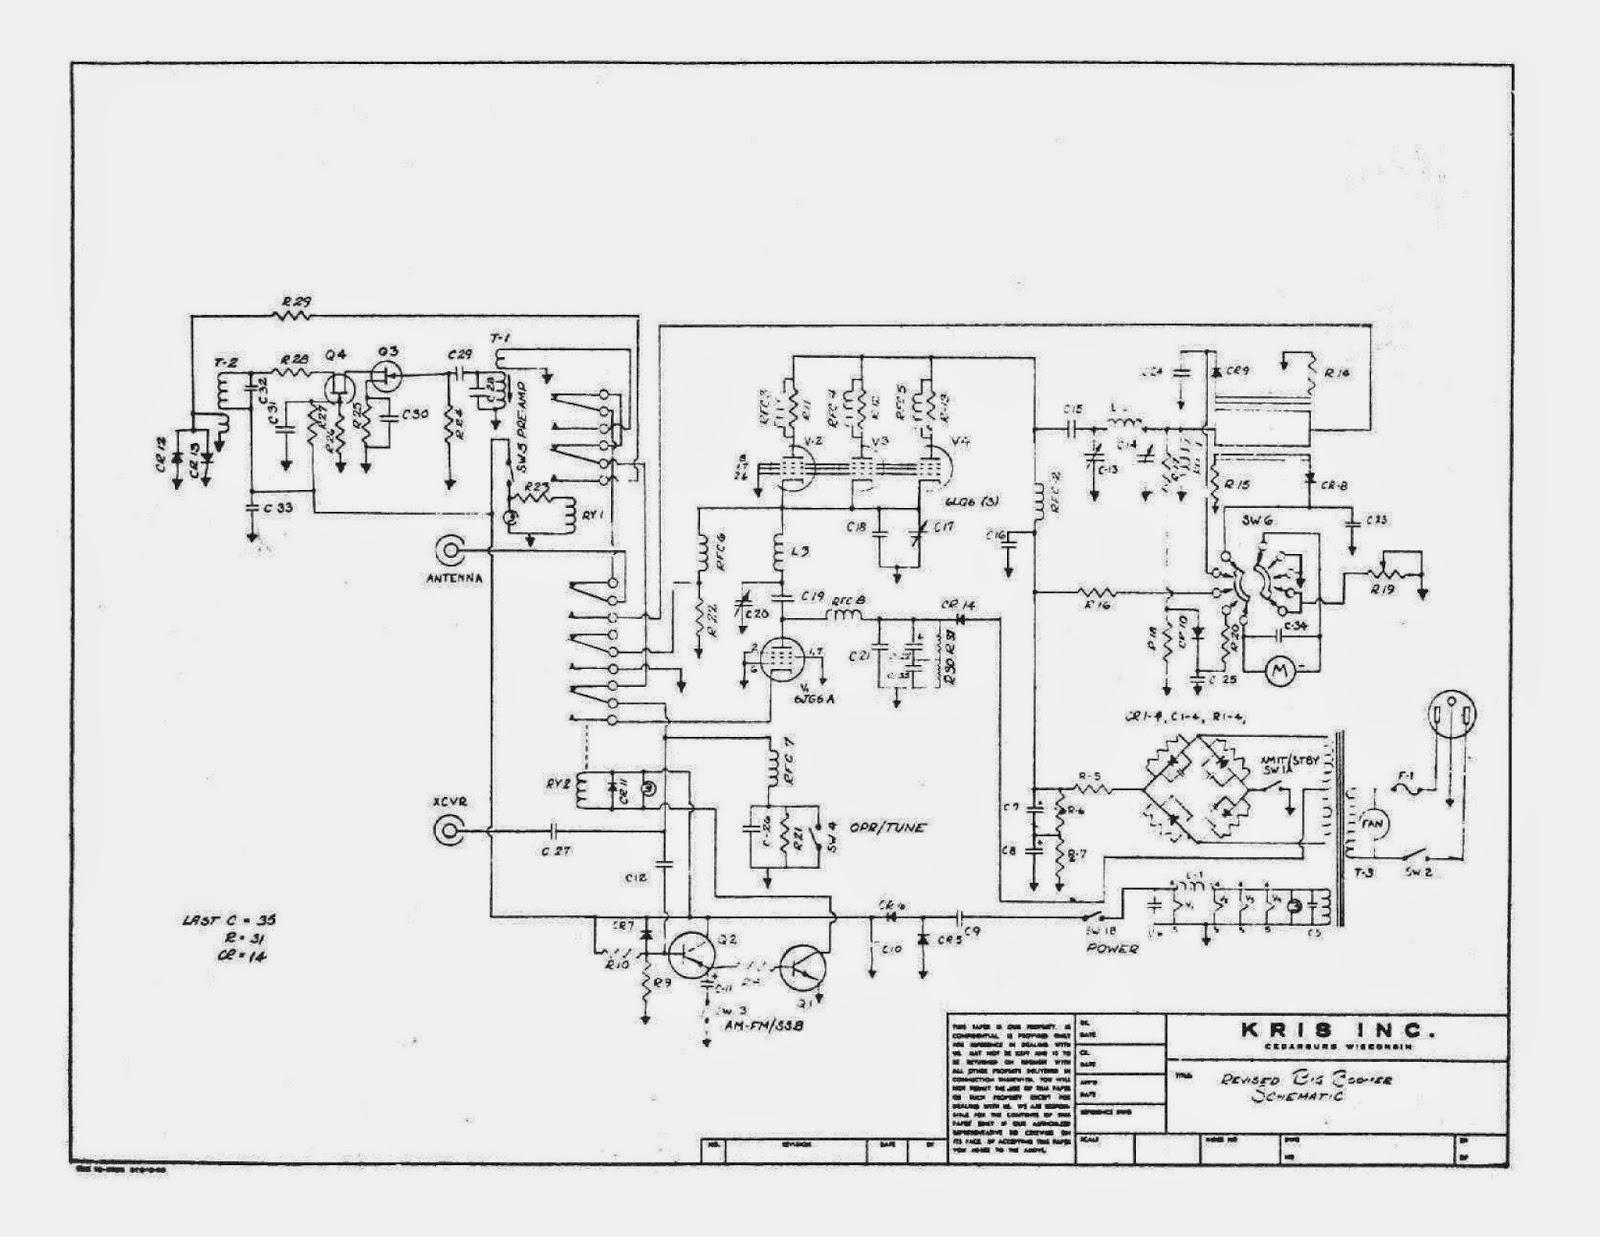 91nr712 Kris Big Boomer 27mhz Linear Amplifier